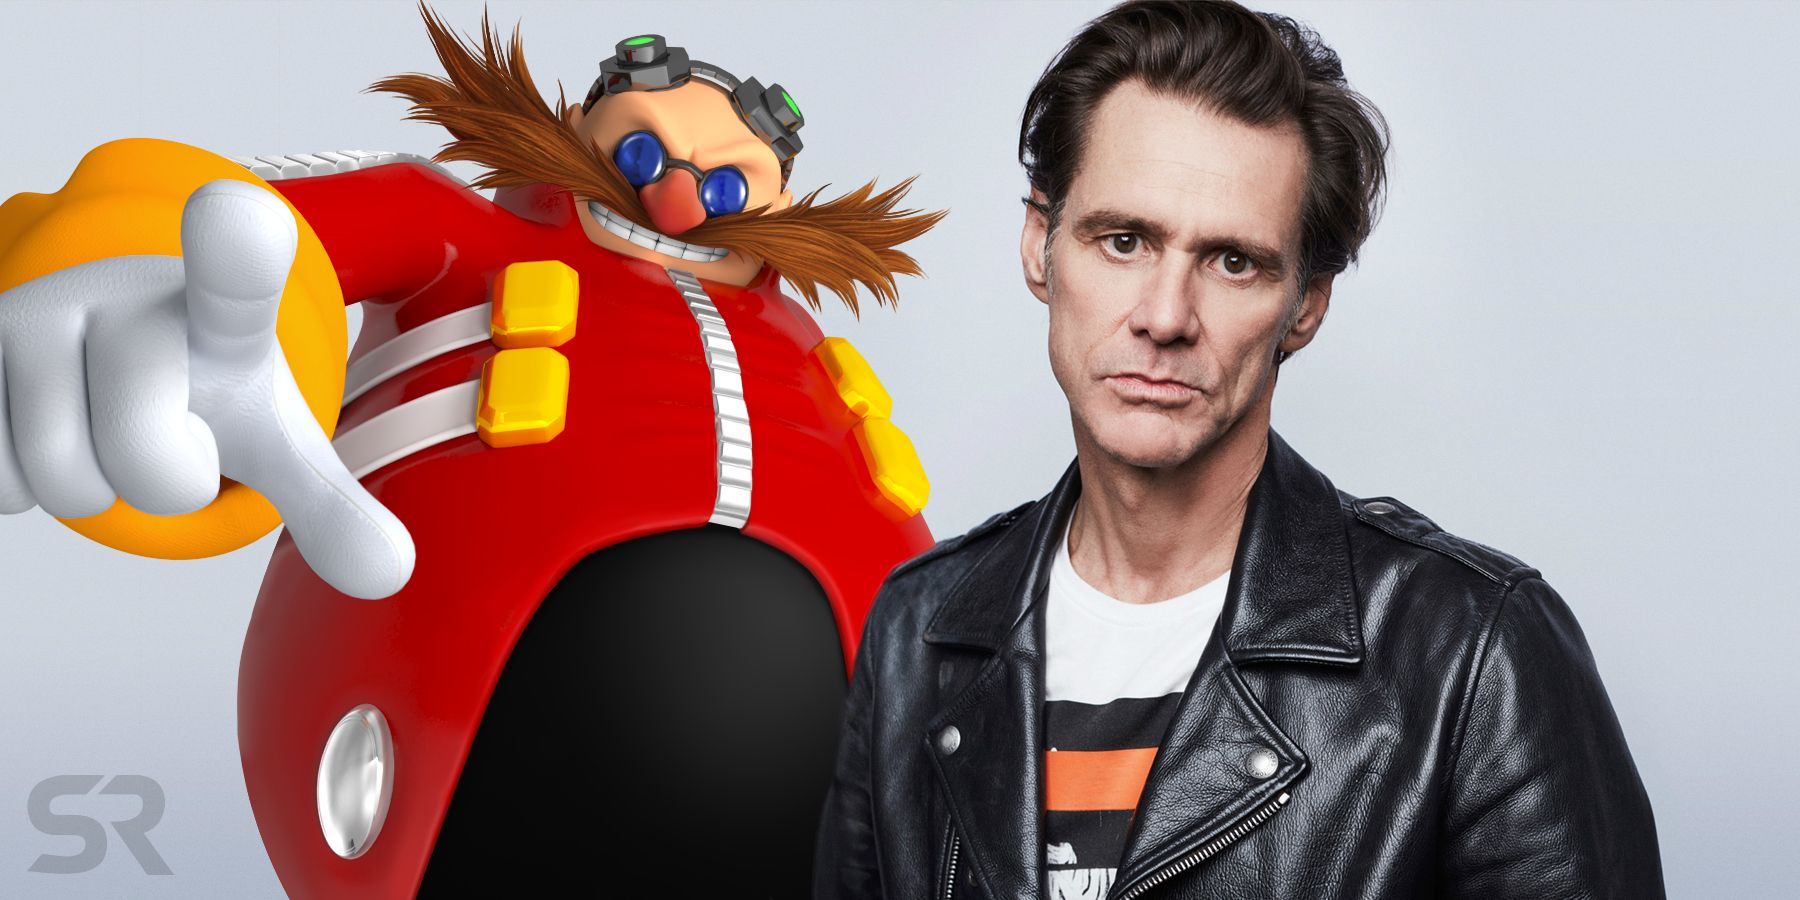 https://static1.srcdn.com/wordpress/wp-content/uploads/2018/06/Sonic-the-Hedgehog-Jim-Carey-Robotnik-SR.jpg